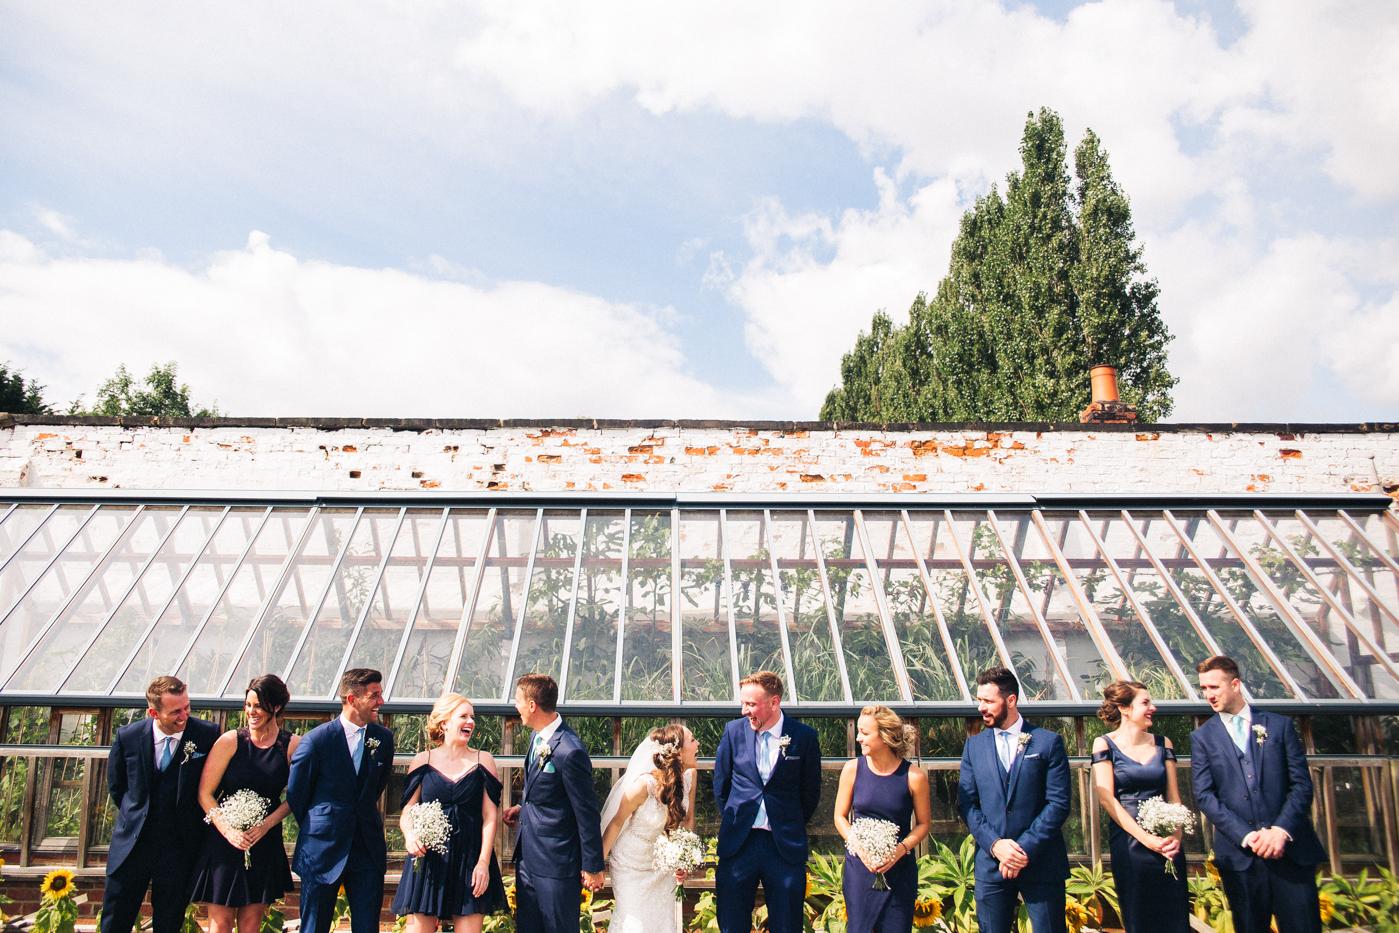 teesside-middlesbrough-north-east-wedding-photographer-creative-wedding-venues-0052.jpg